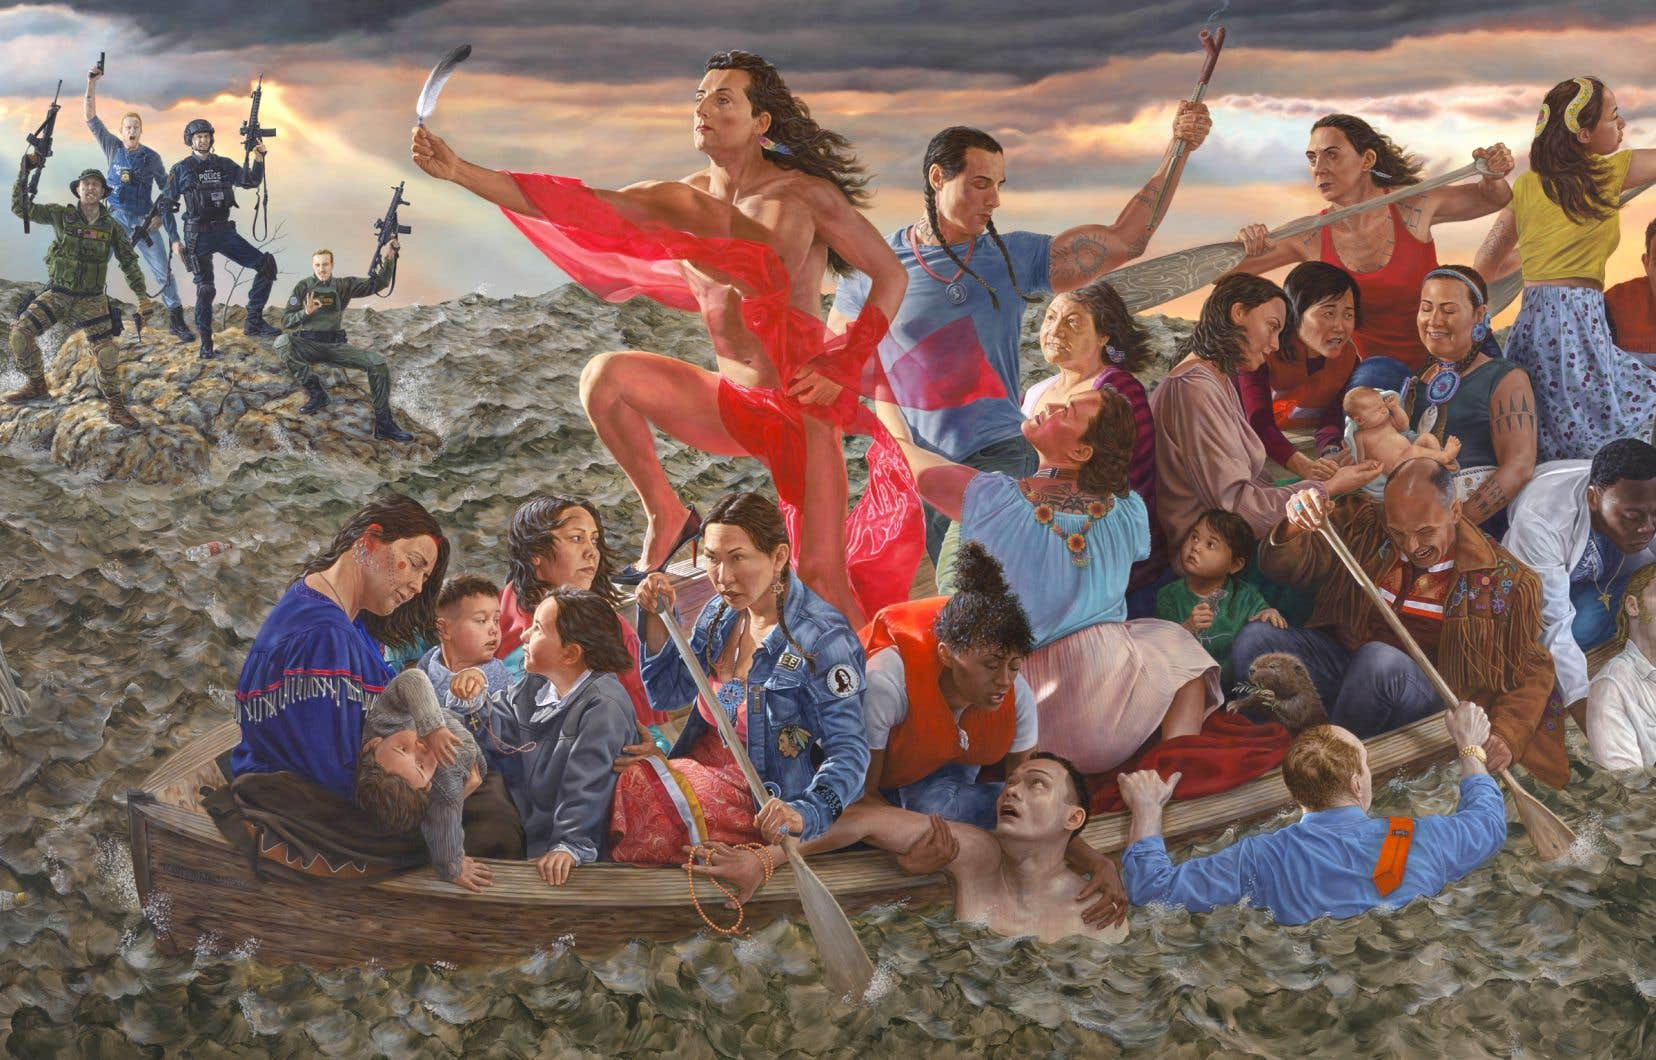 Kent Monkman, «Resurgence of the People», 2019. Collection du Metropolitan Museum of Art.